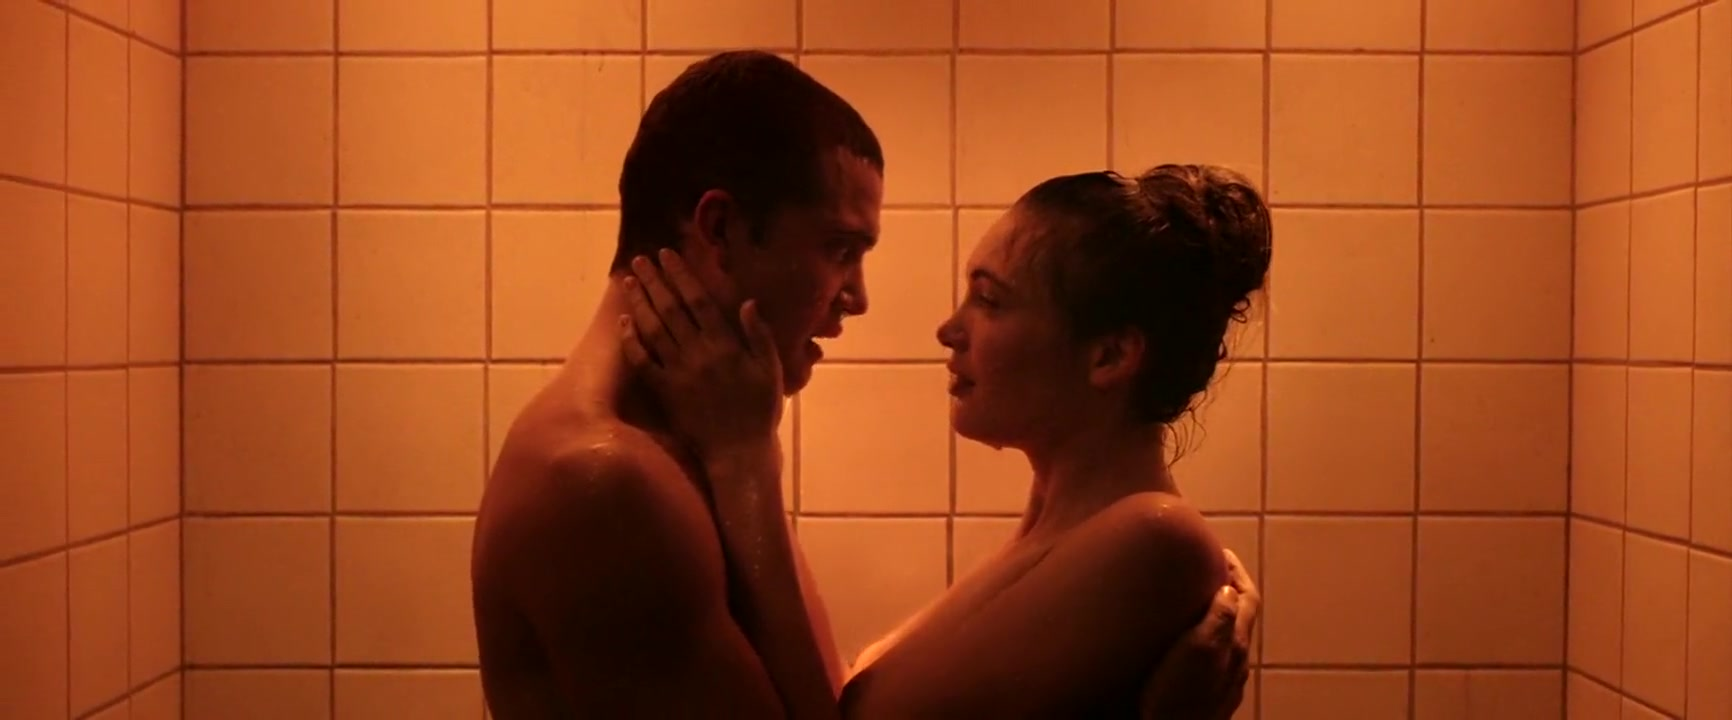 Full movie Ambavi suramis tsikhitsa online dating